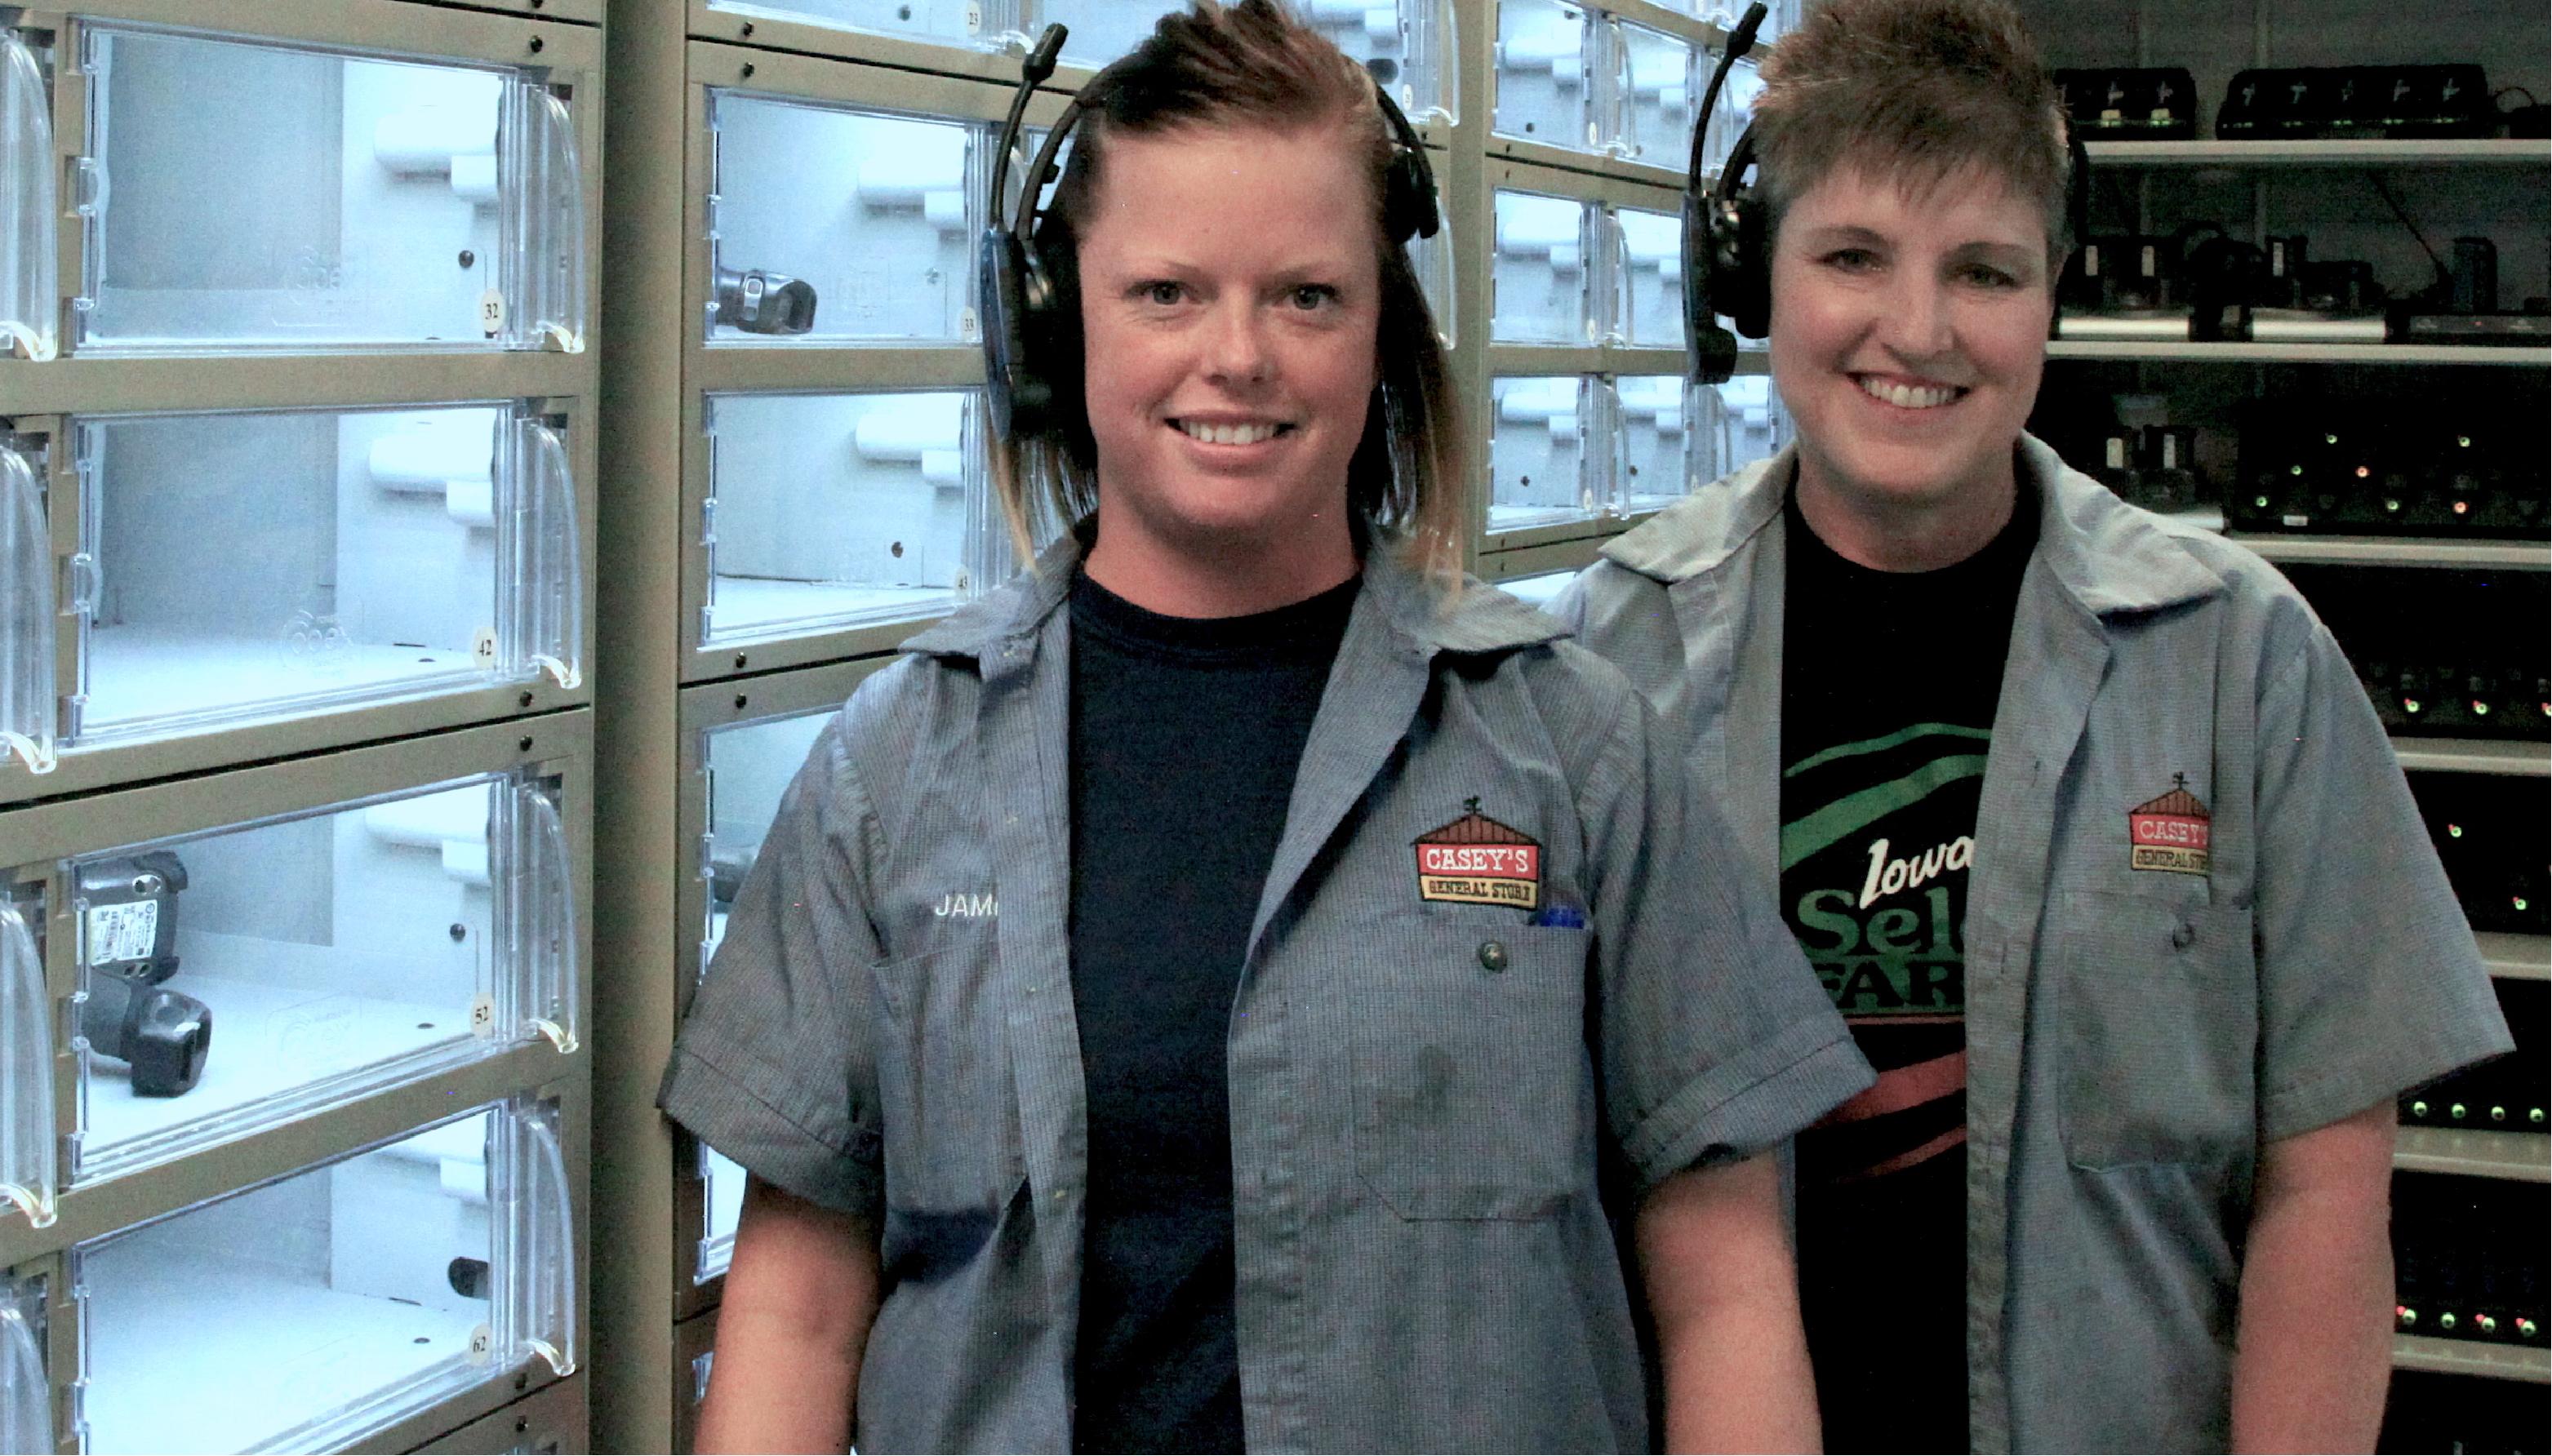 Warehouse associates wearing voice picking headsets